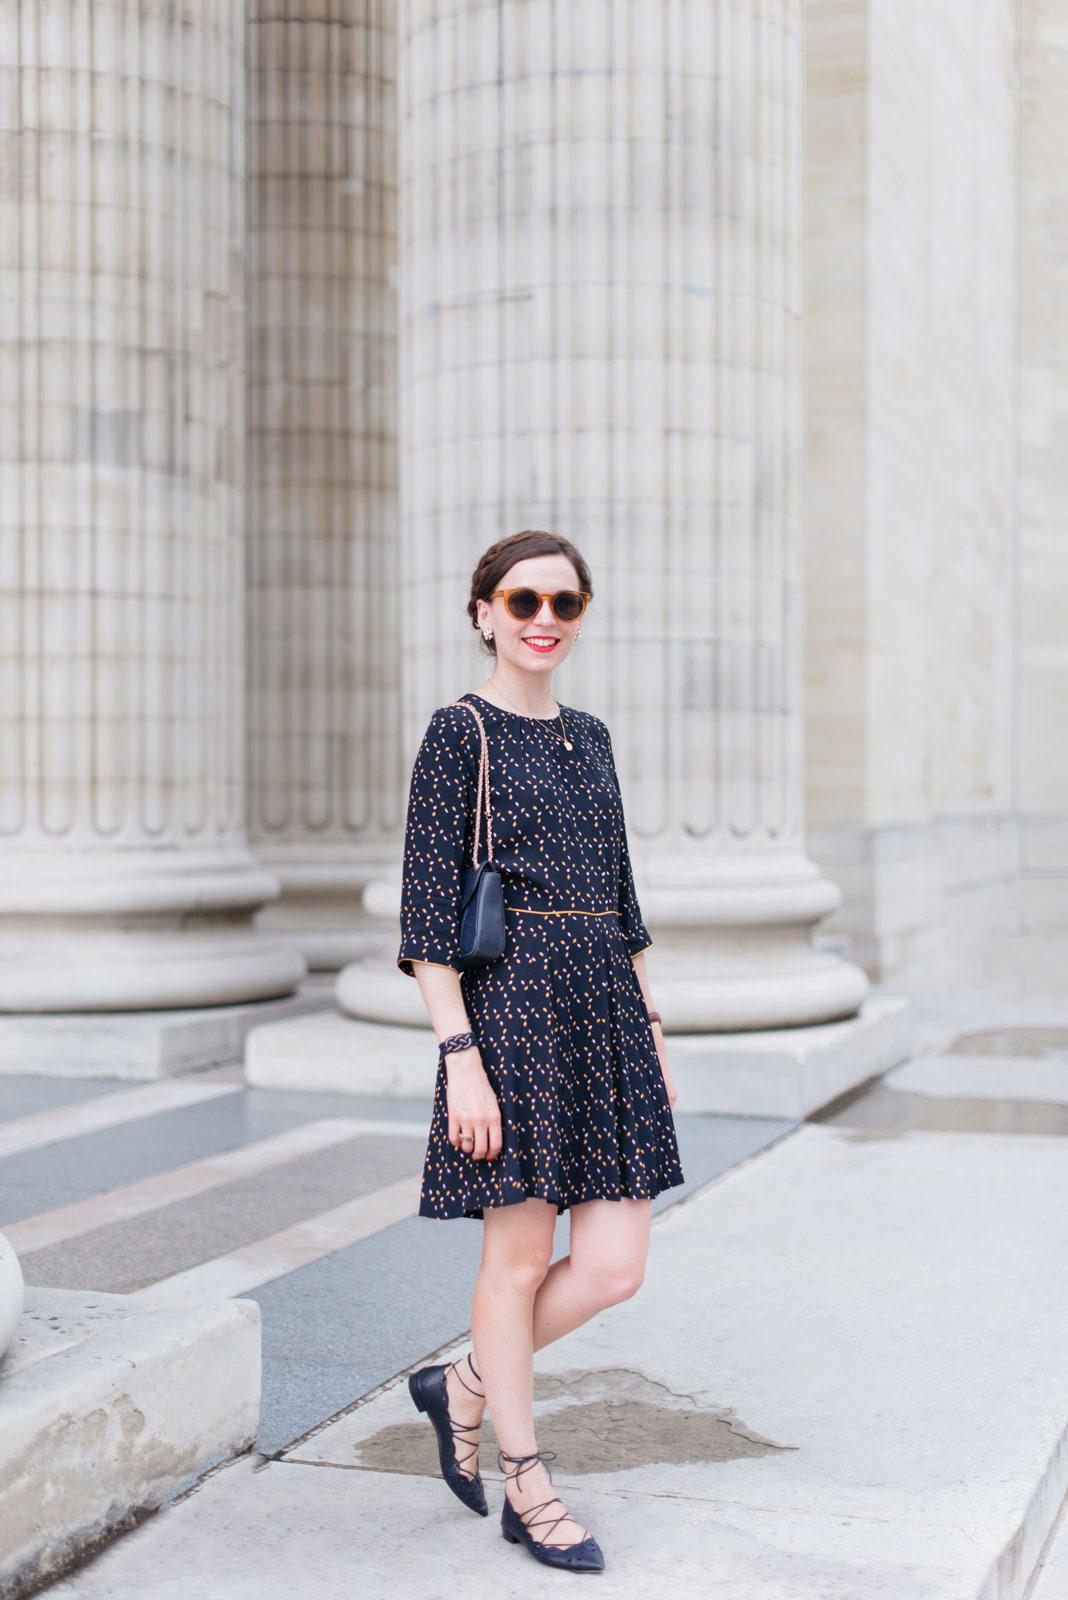 Blog-Mode-And-The-City-Looks-La-Petite-Francaise